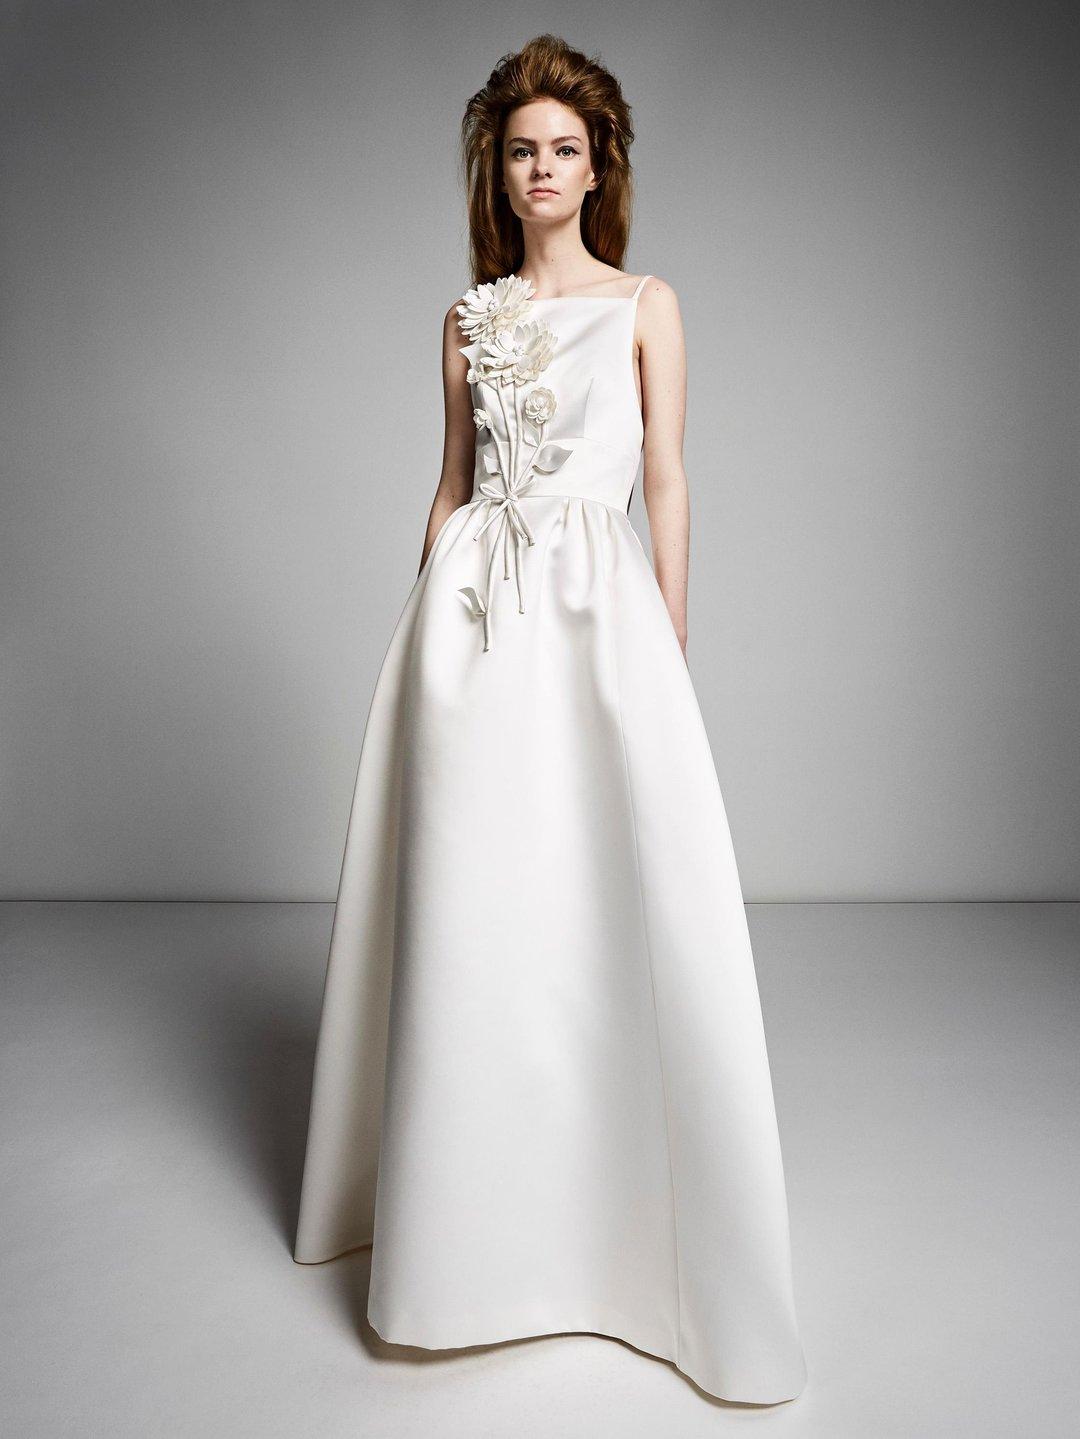 flower bouquet gown  dress photo